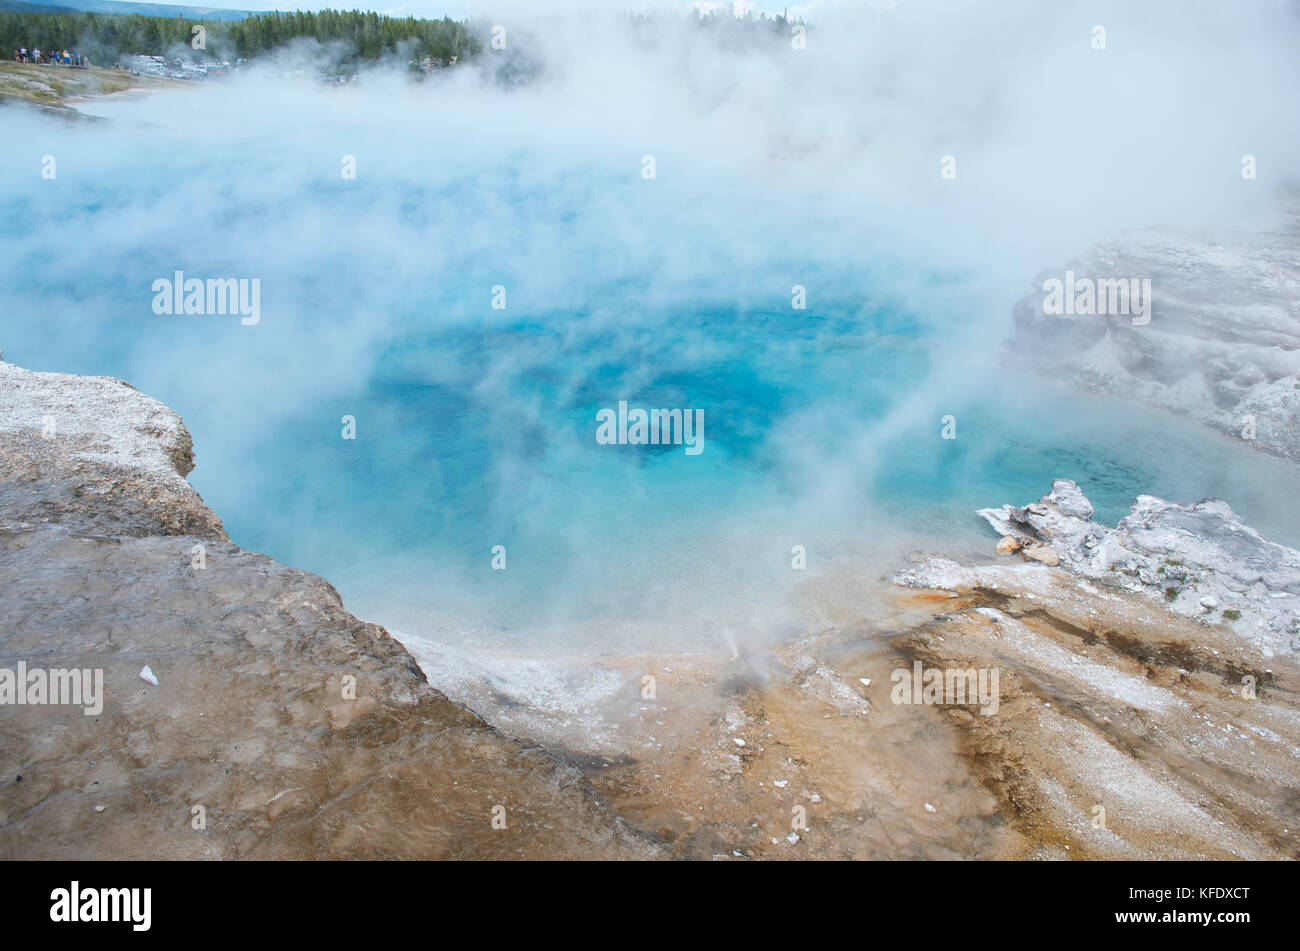 Caldara Hot Spring Pool in Yellowstone National Park, Wyoming, USA - Stock Image